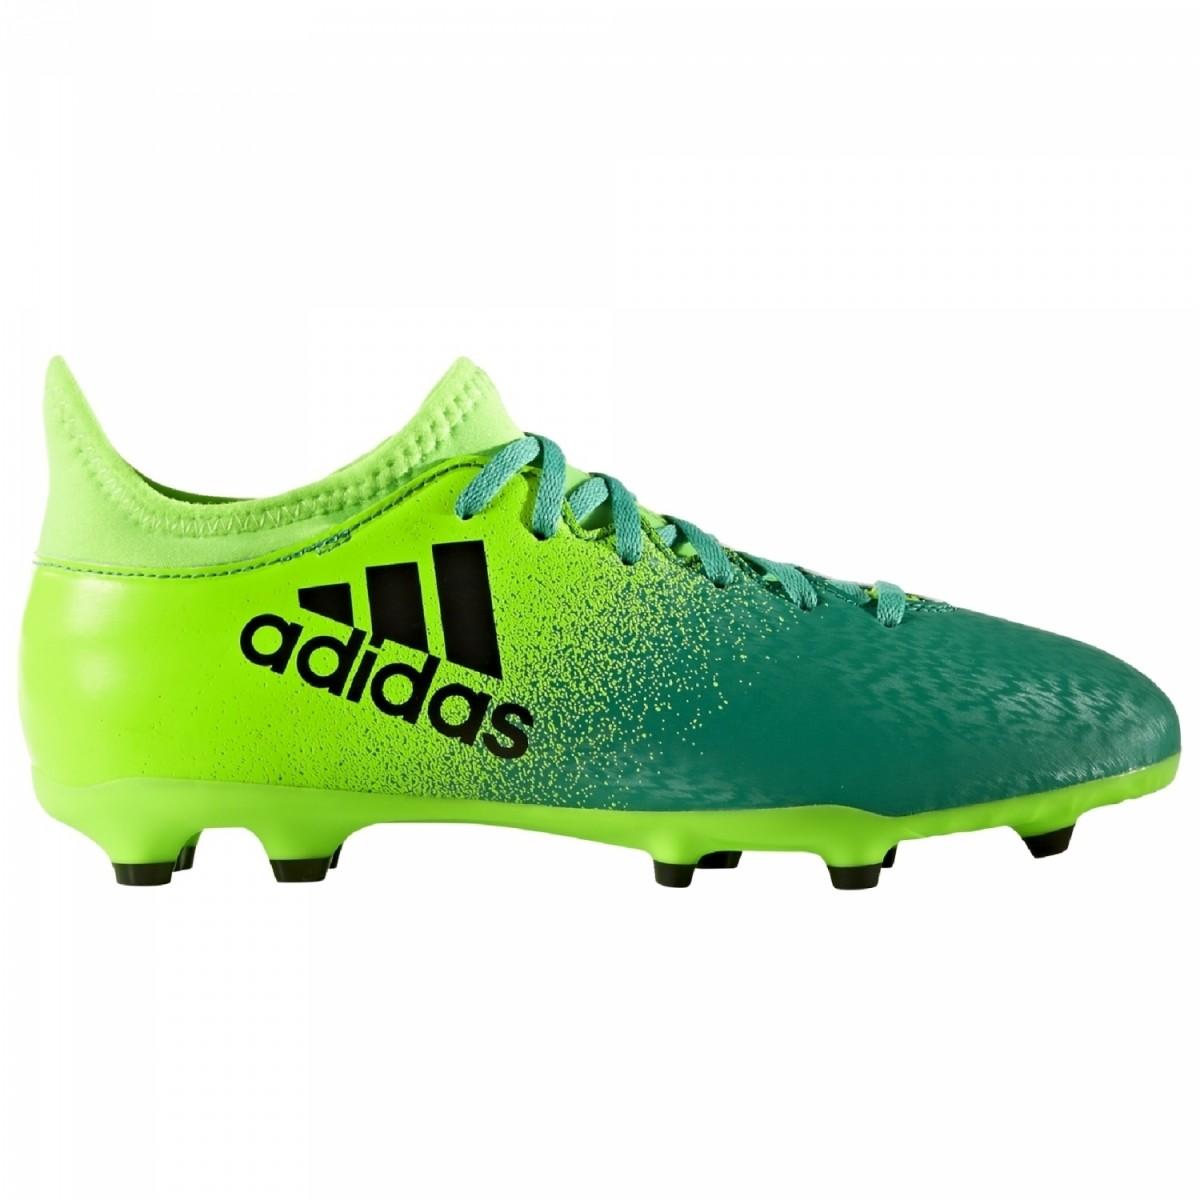 adidas X 16.3 FG Kinder Fußballschuhe Nocken grün